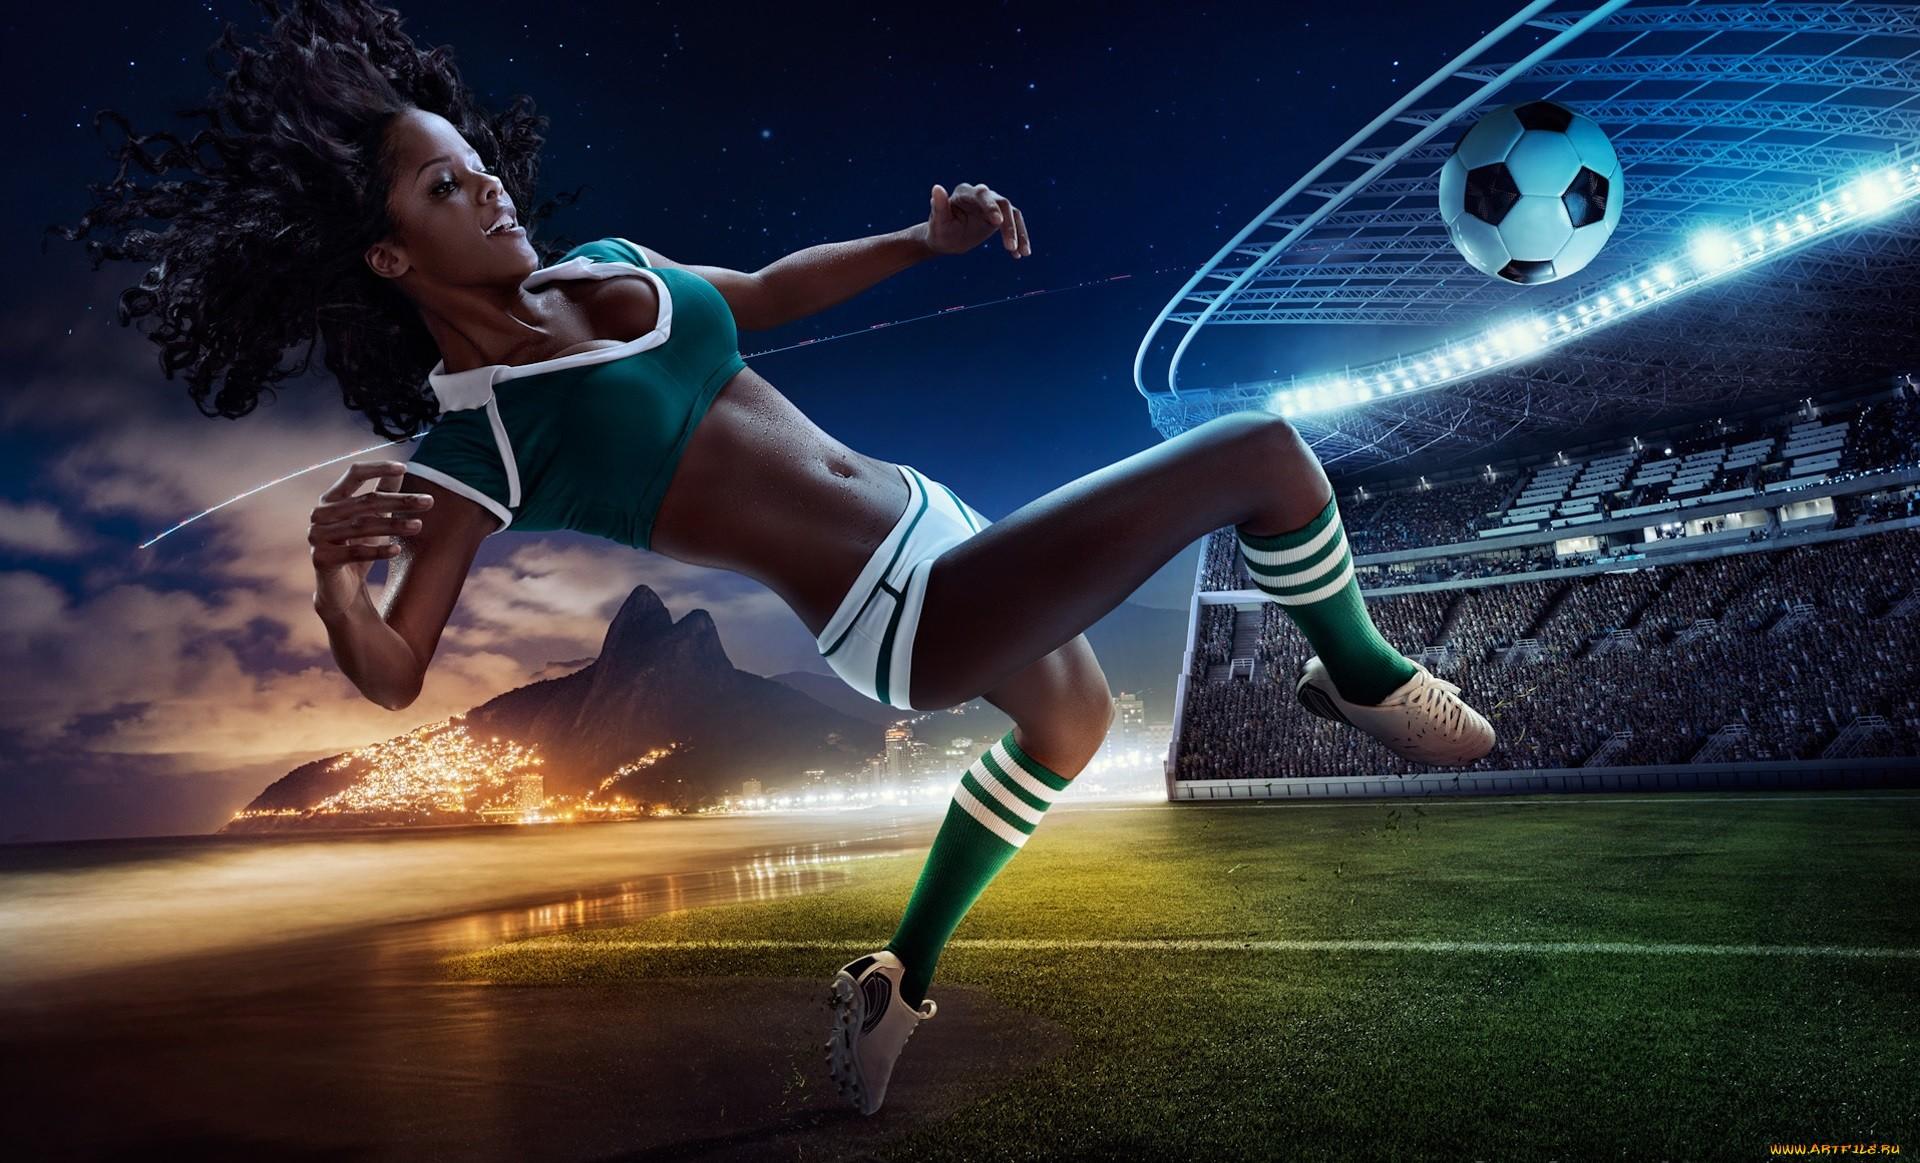 Soccer Girls Wallpaper Free: Wallpaper : Sports, Digital Art, Women, Model, Jumping